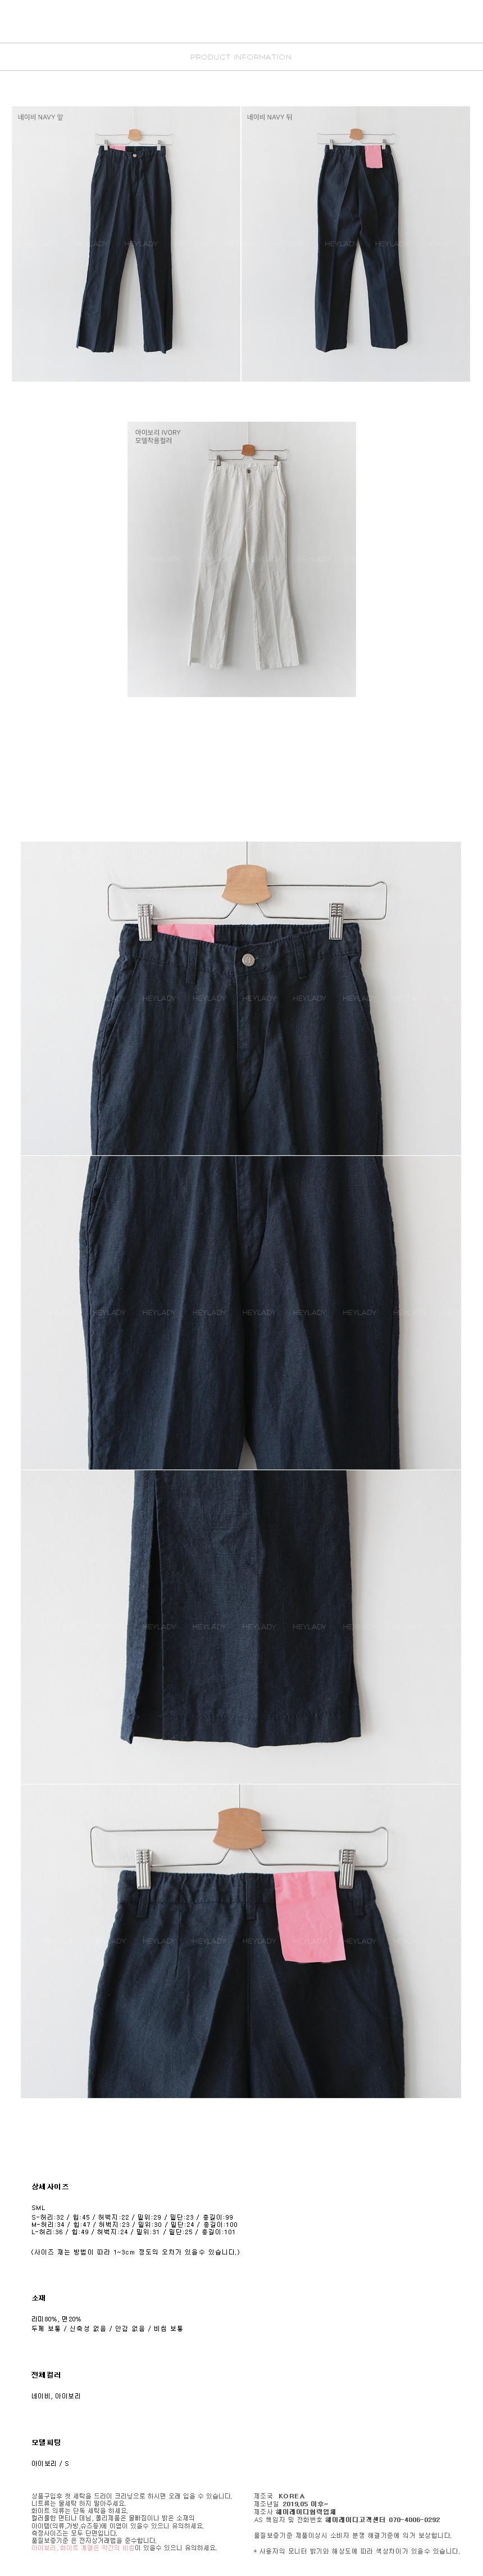 Ridaslit Lamy Pants